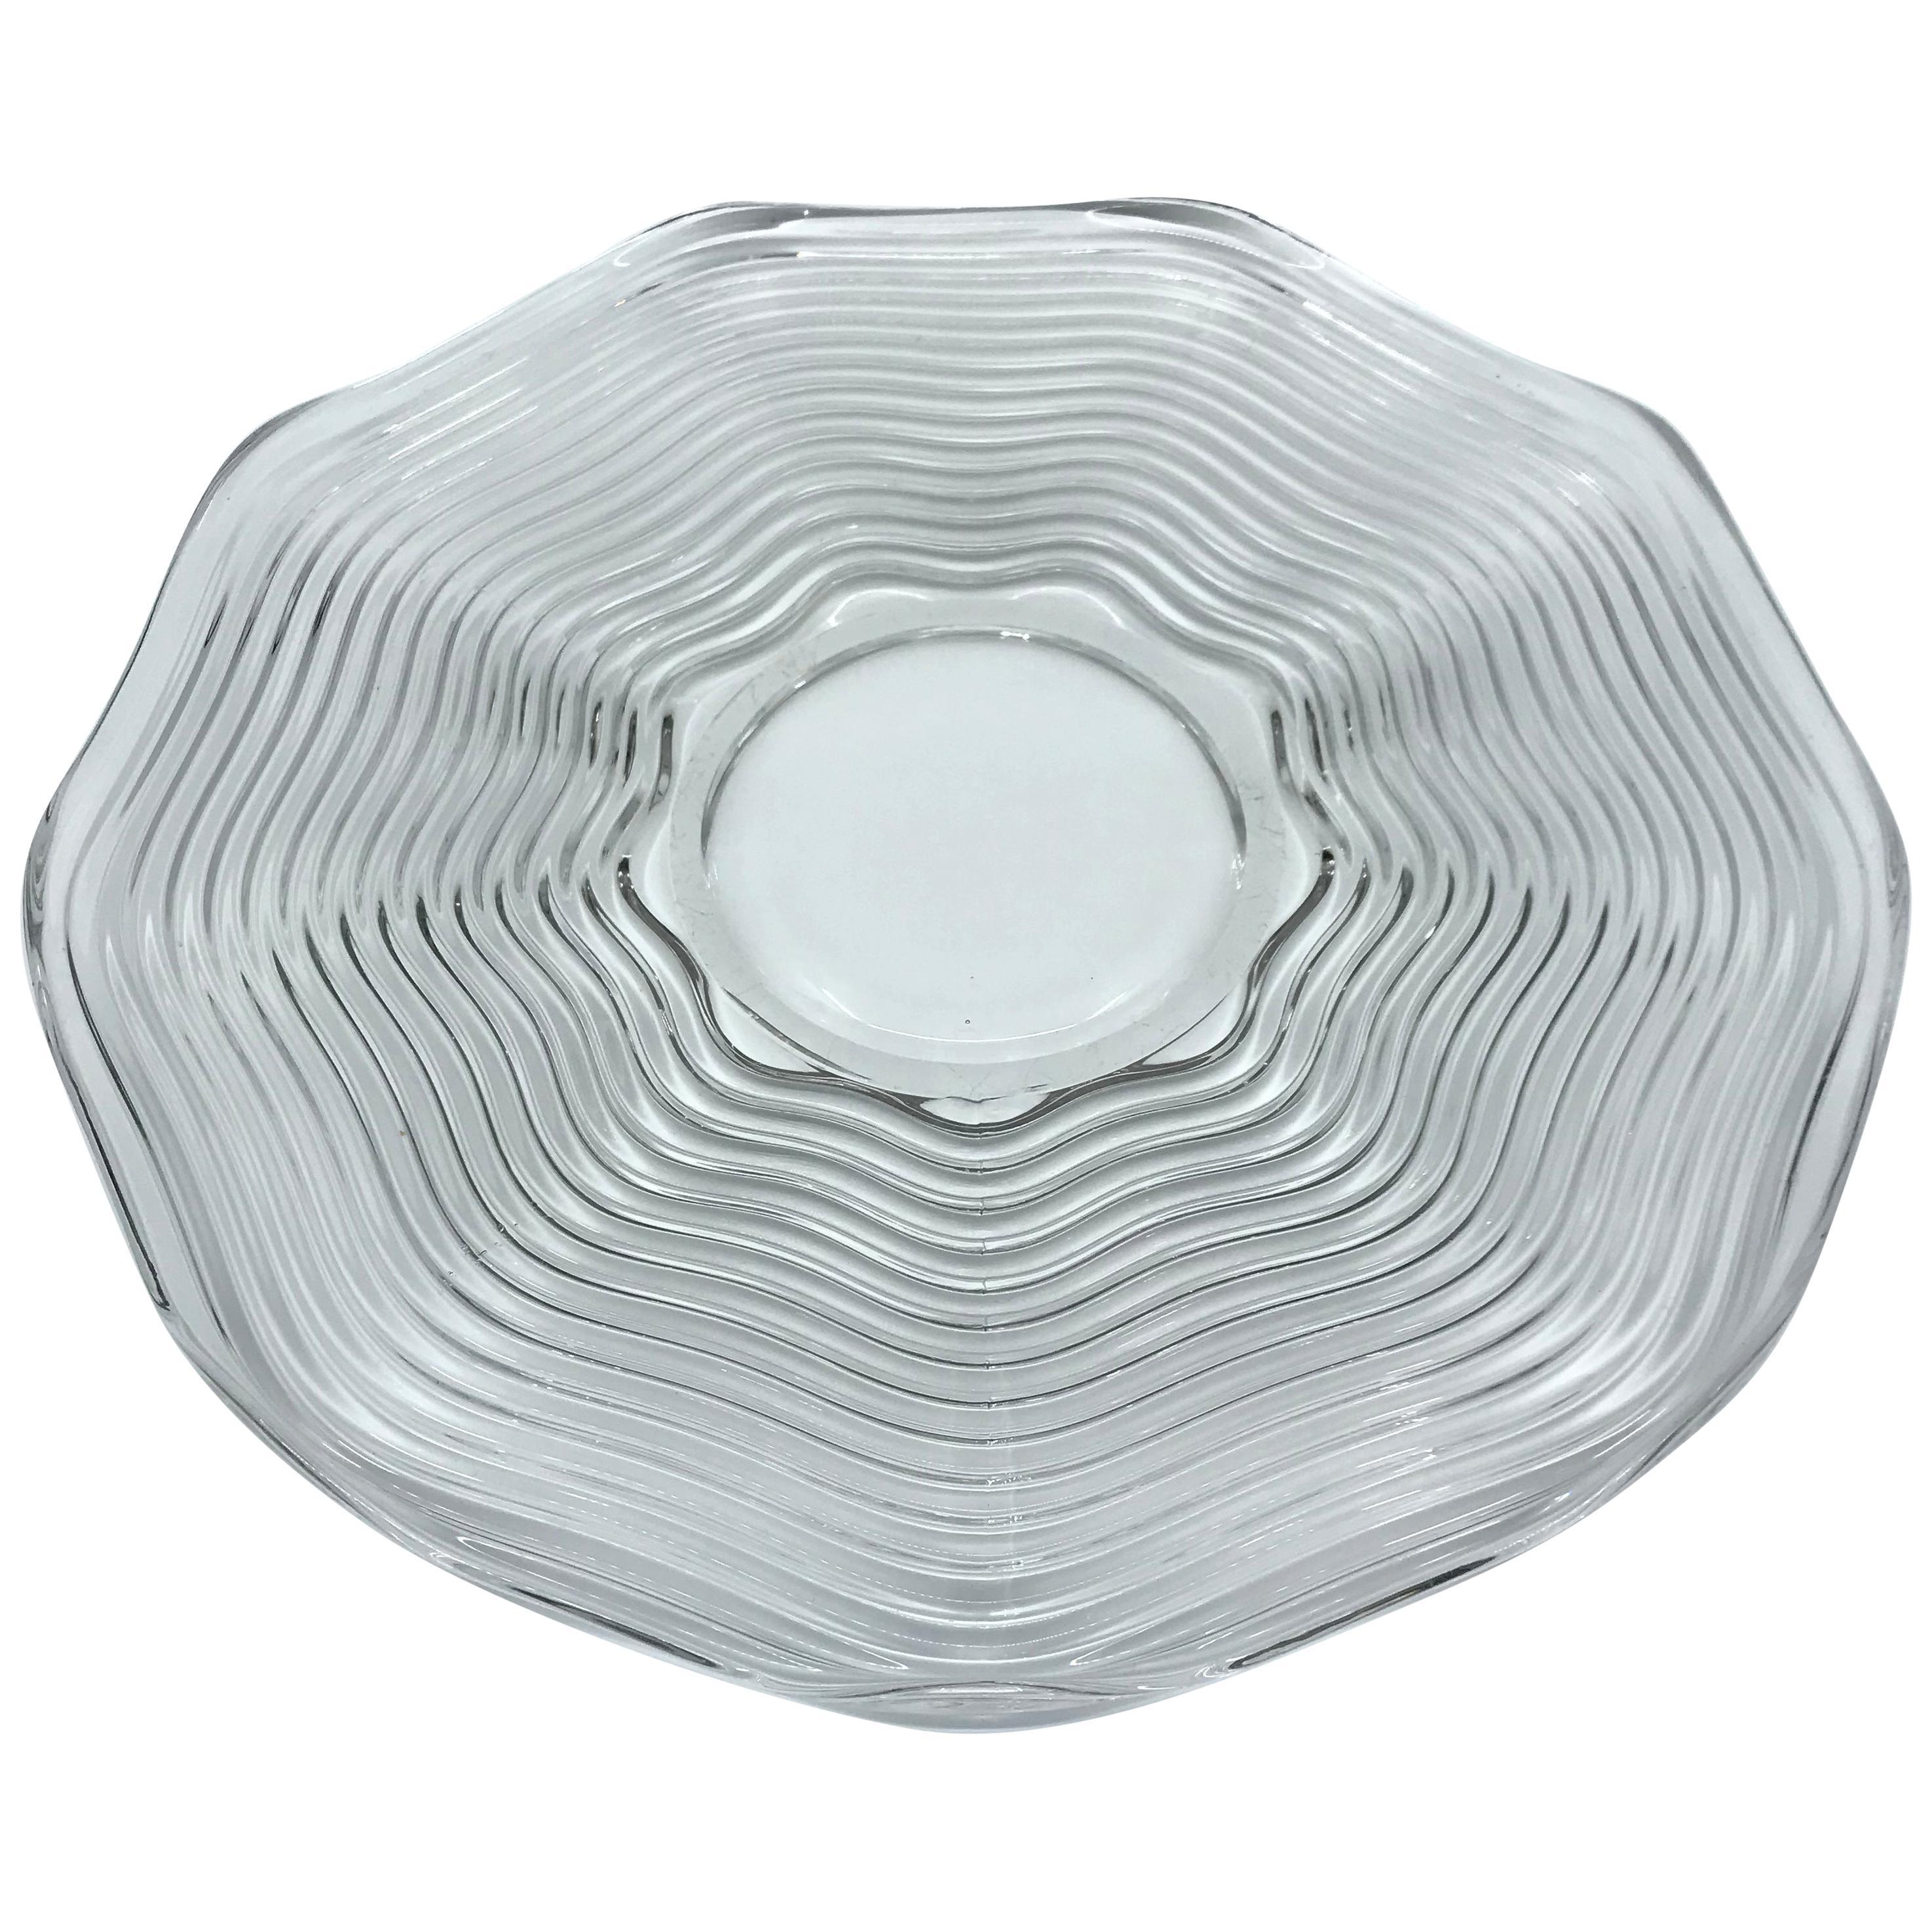 1930s Clear Glass Deco Serving Platter